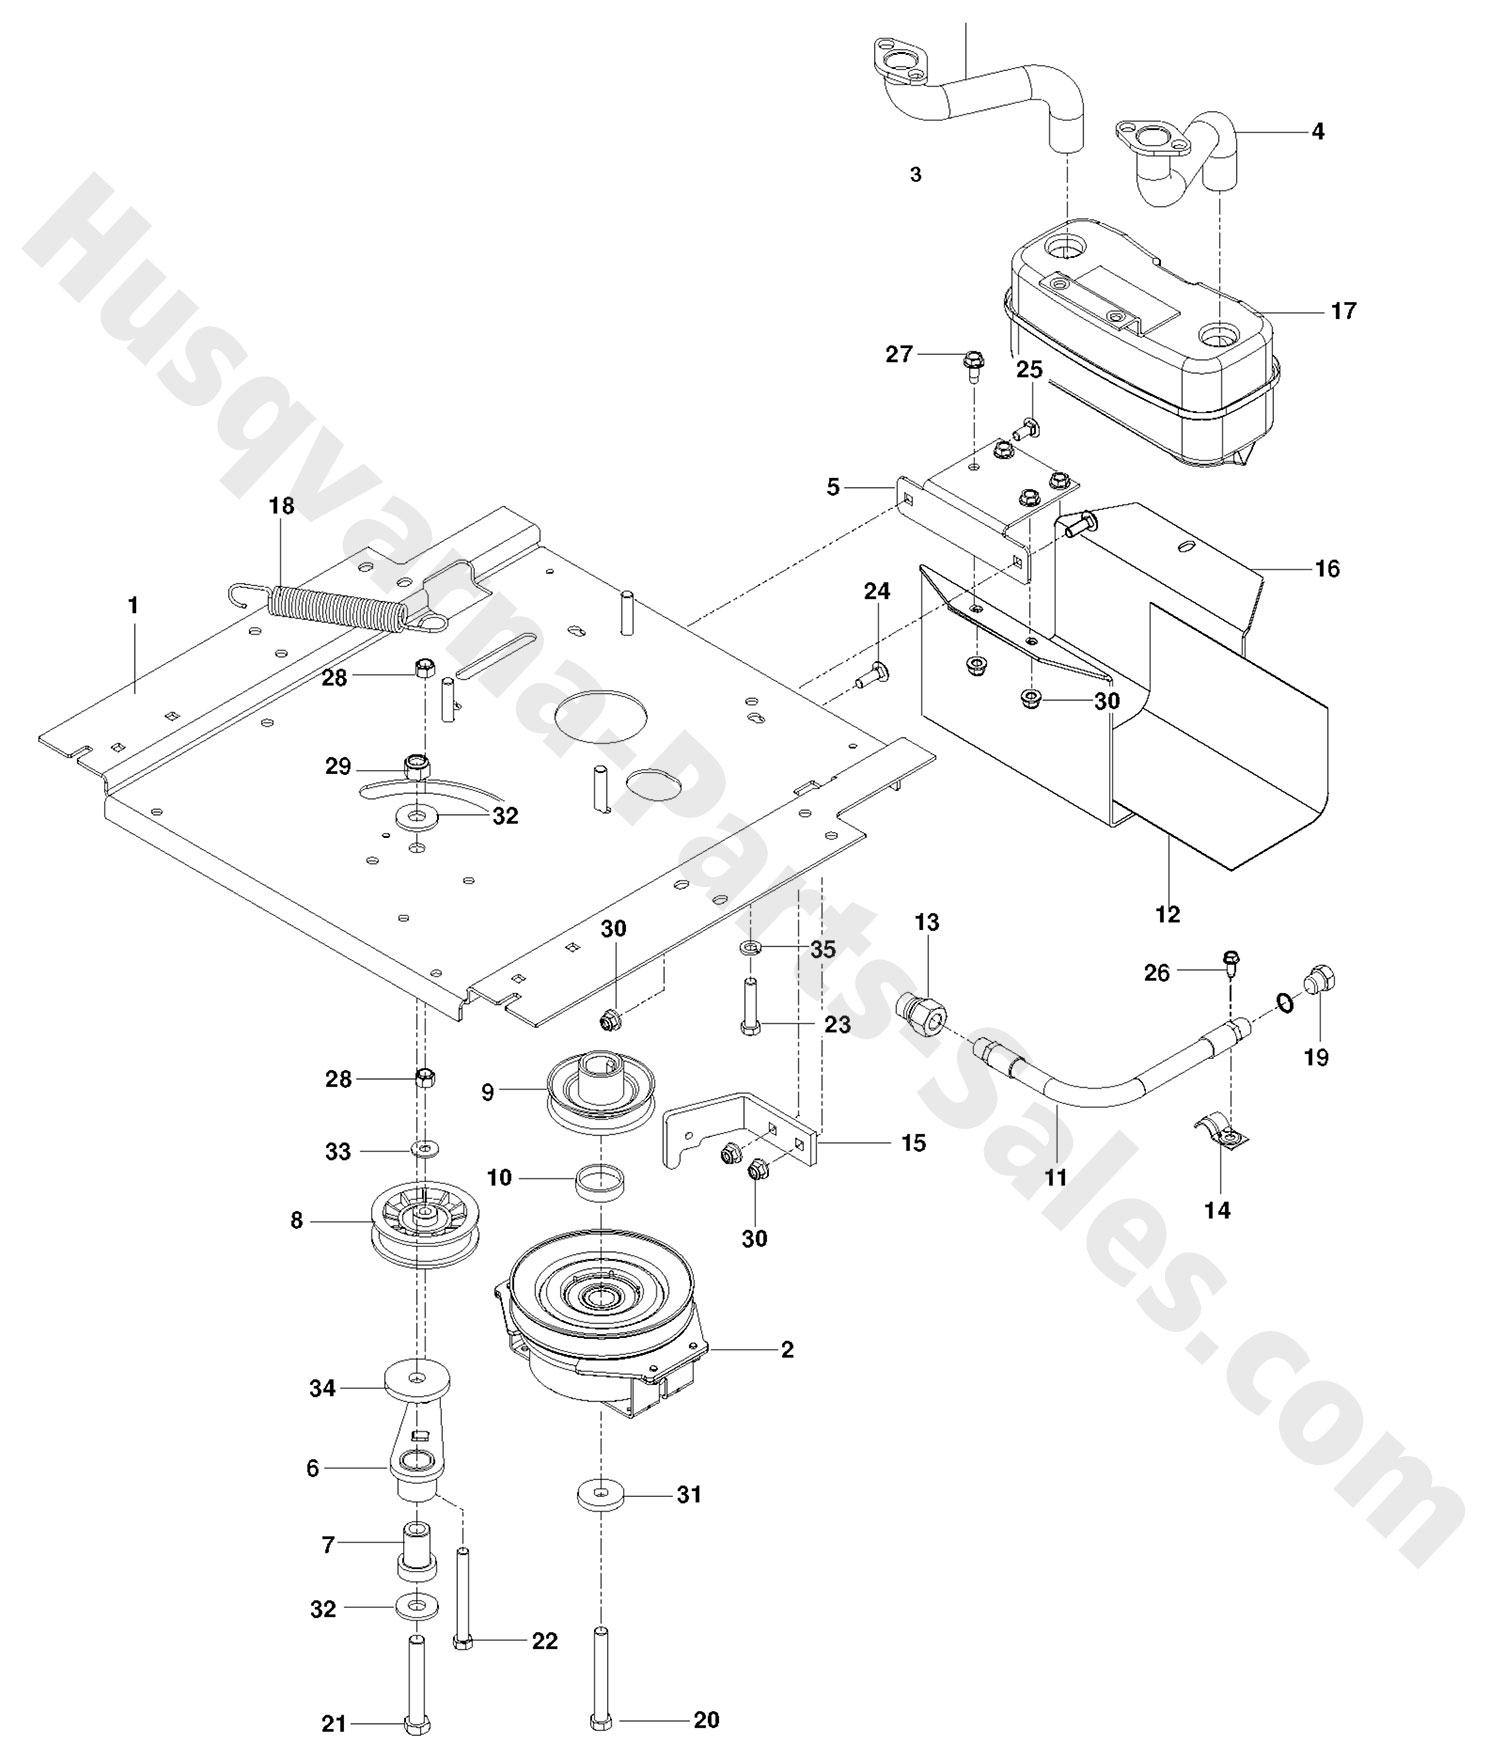 Husqvarna Lgt2554 Kohler Wiring Diagram Rz 5424 1500x1764